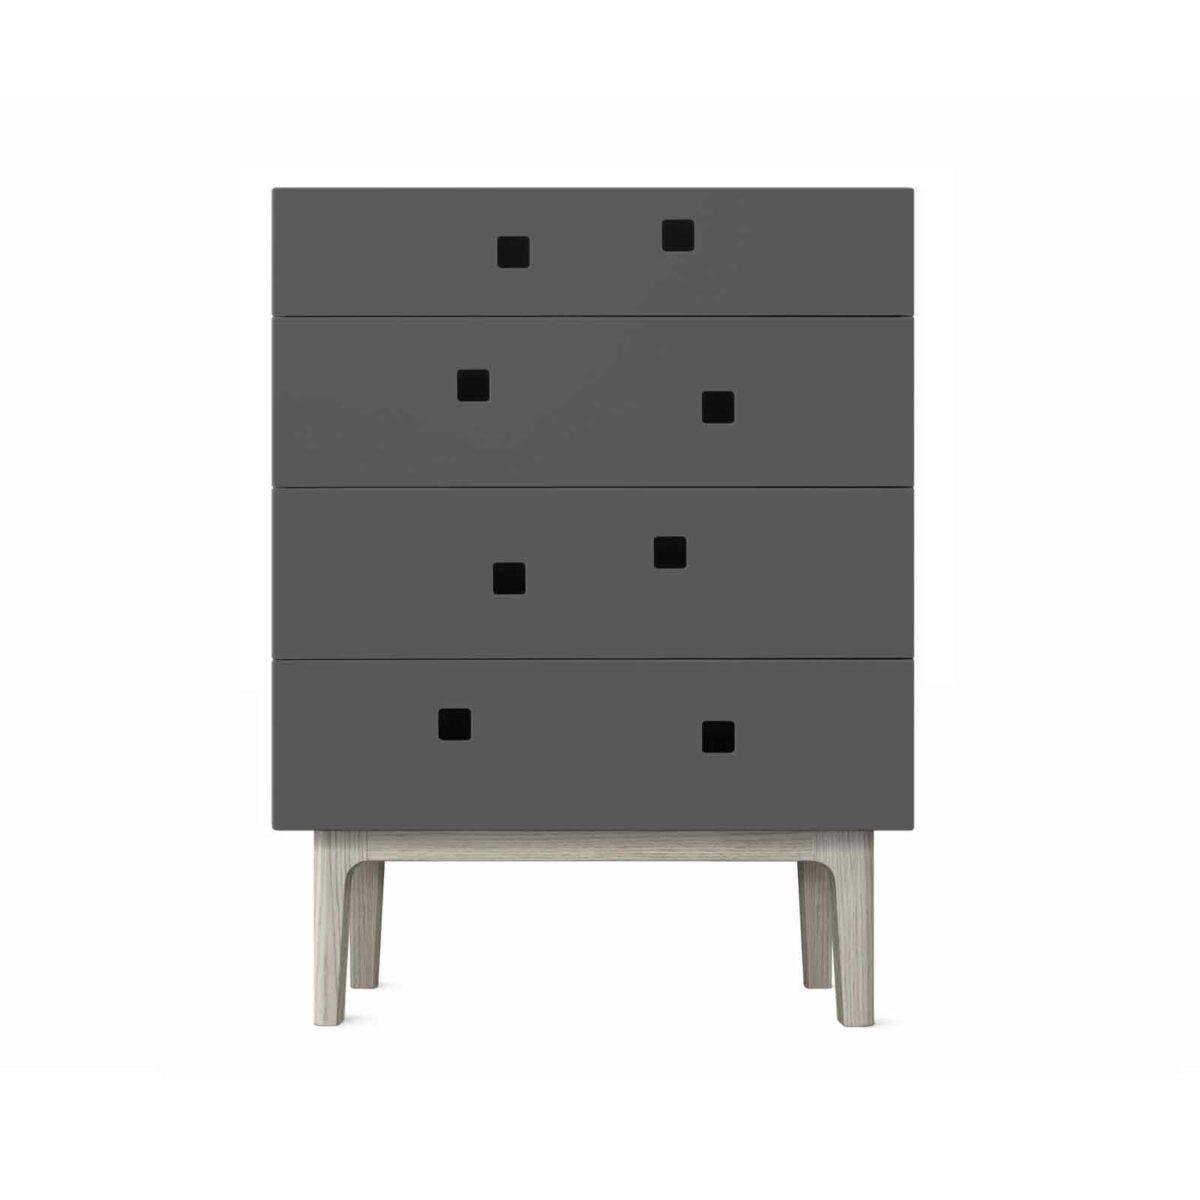 PEEP B3 grey oakbase